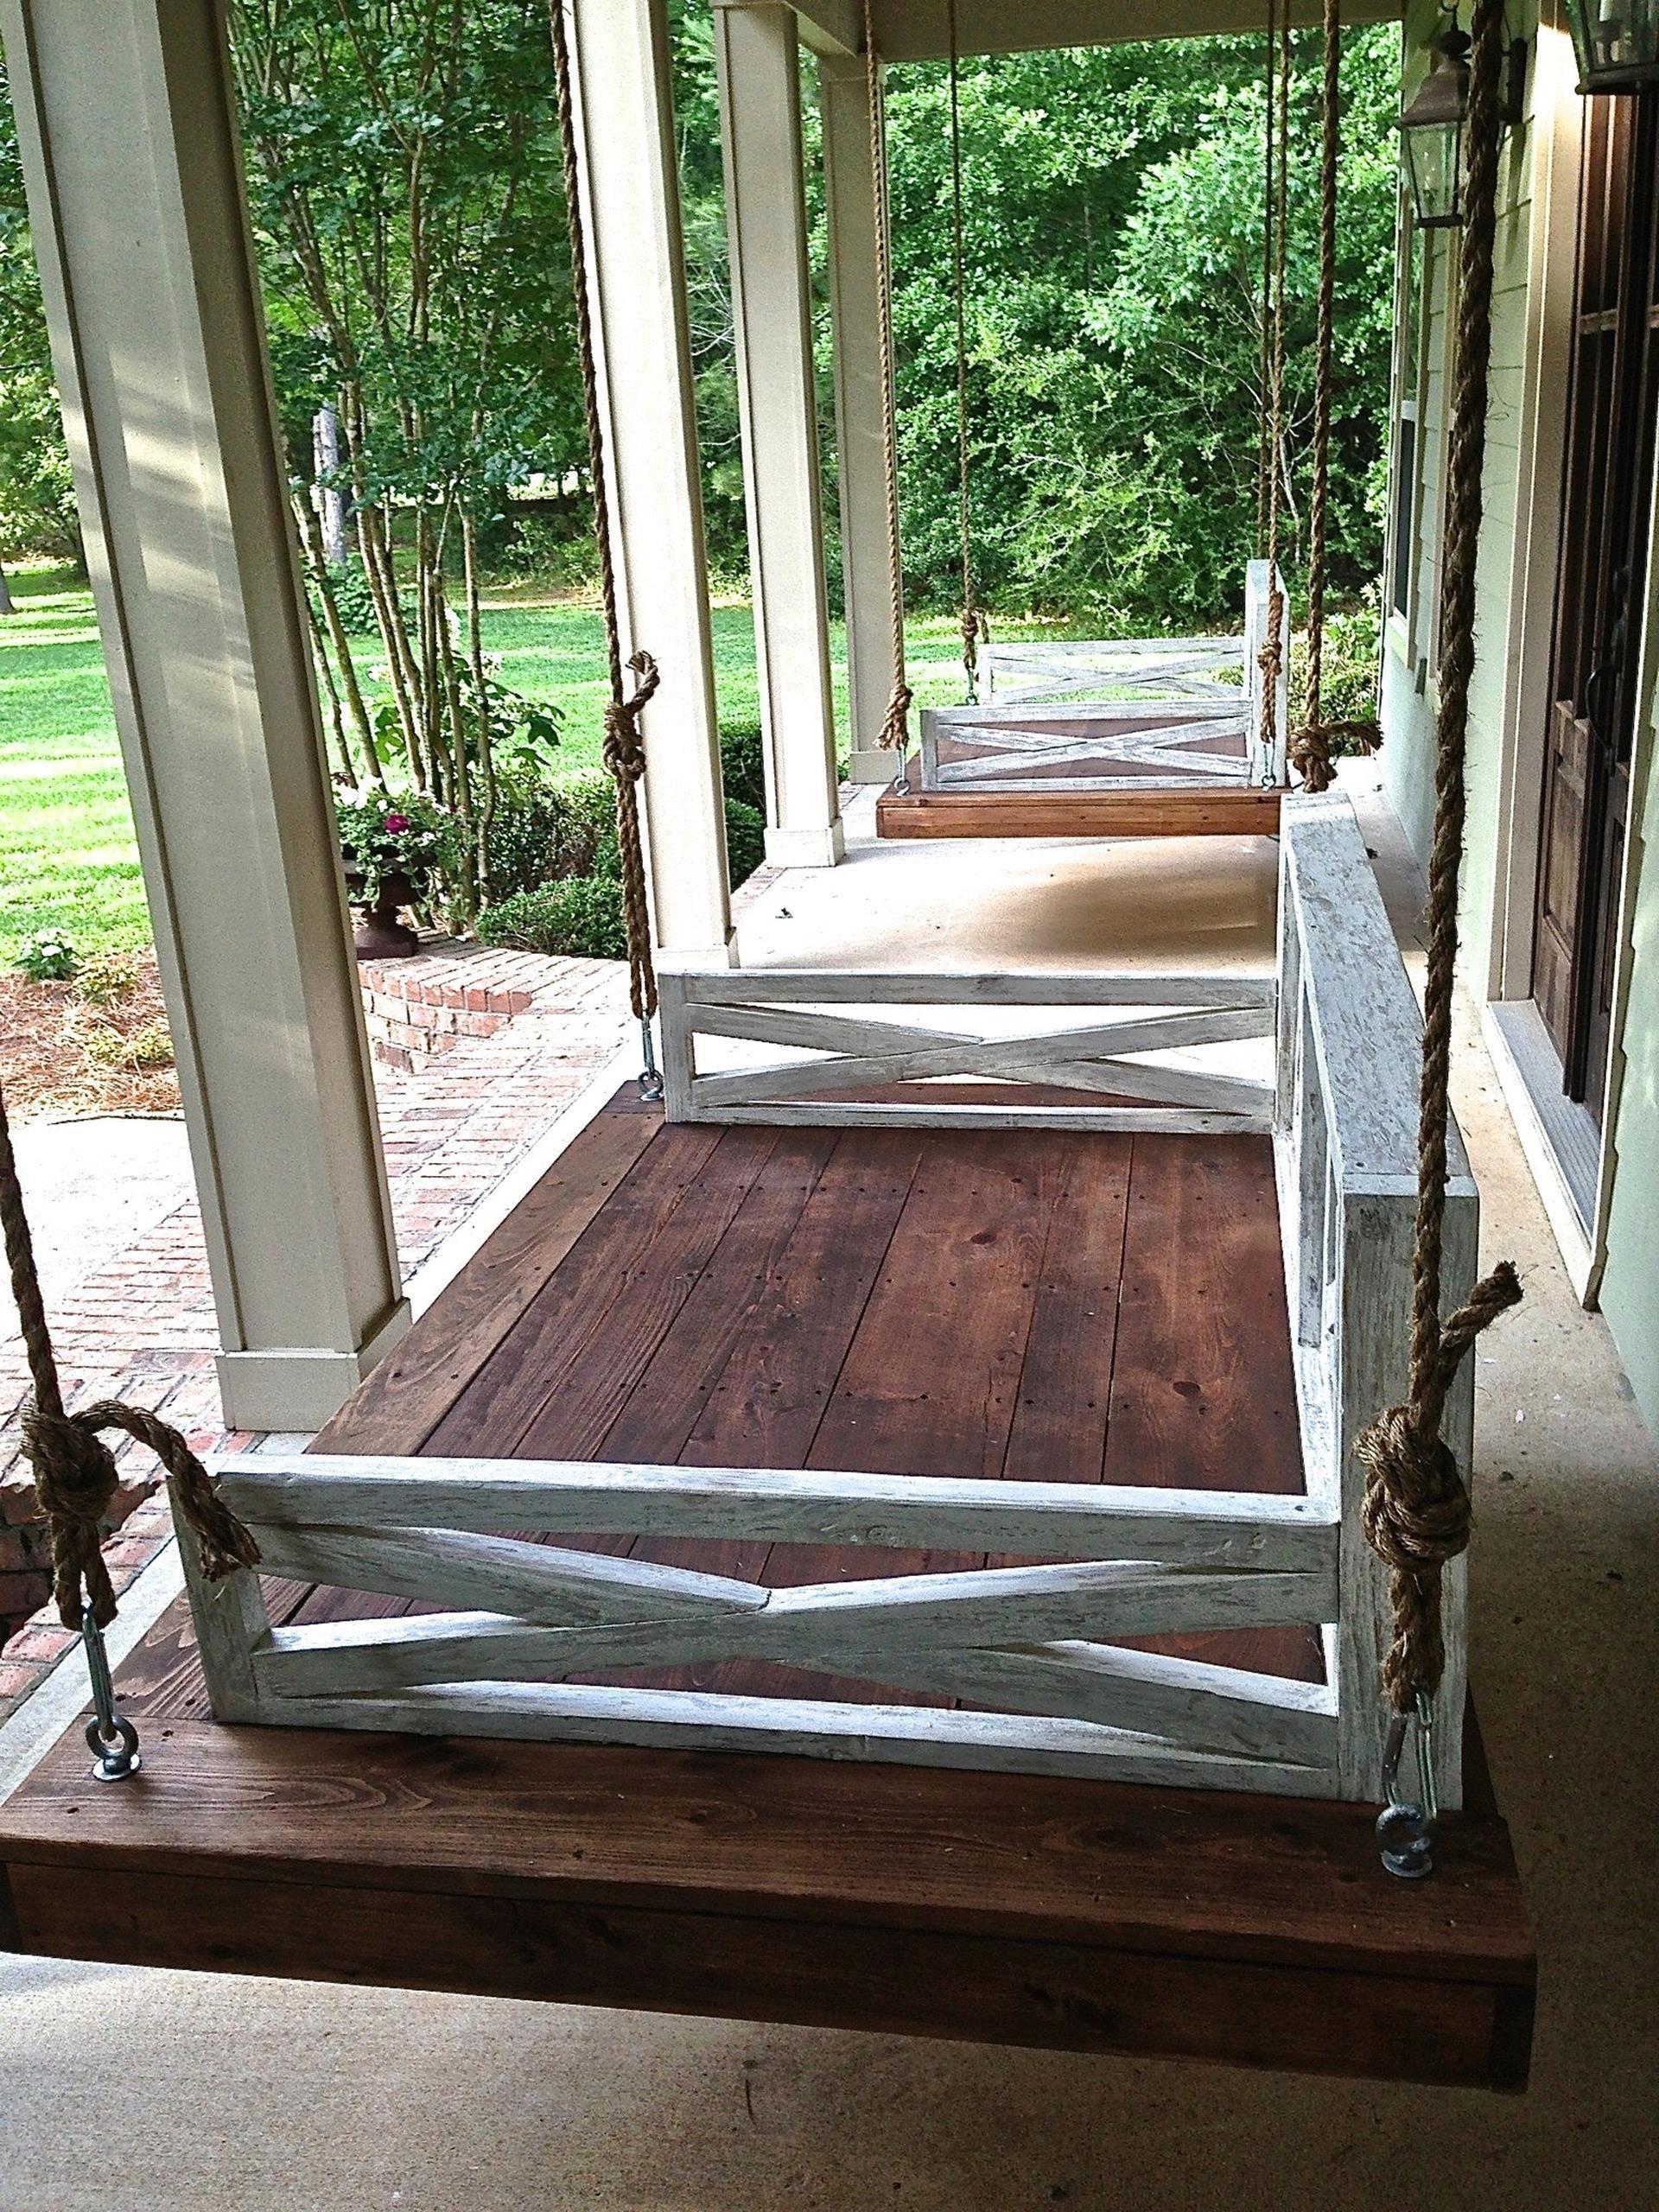 Diy Porch Swing Bed Plans Ideas On A Budget 46 Muebles Para Porche Porches Rusticos Muebles De Exterior